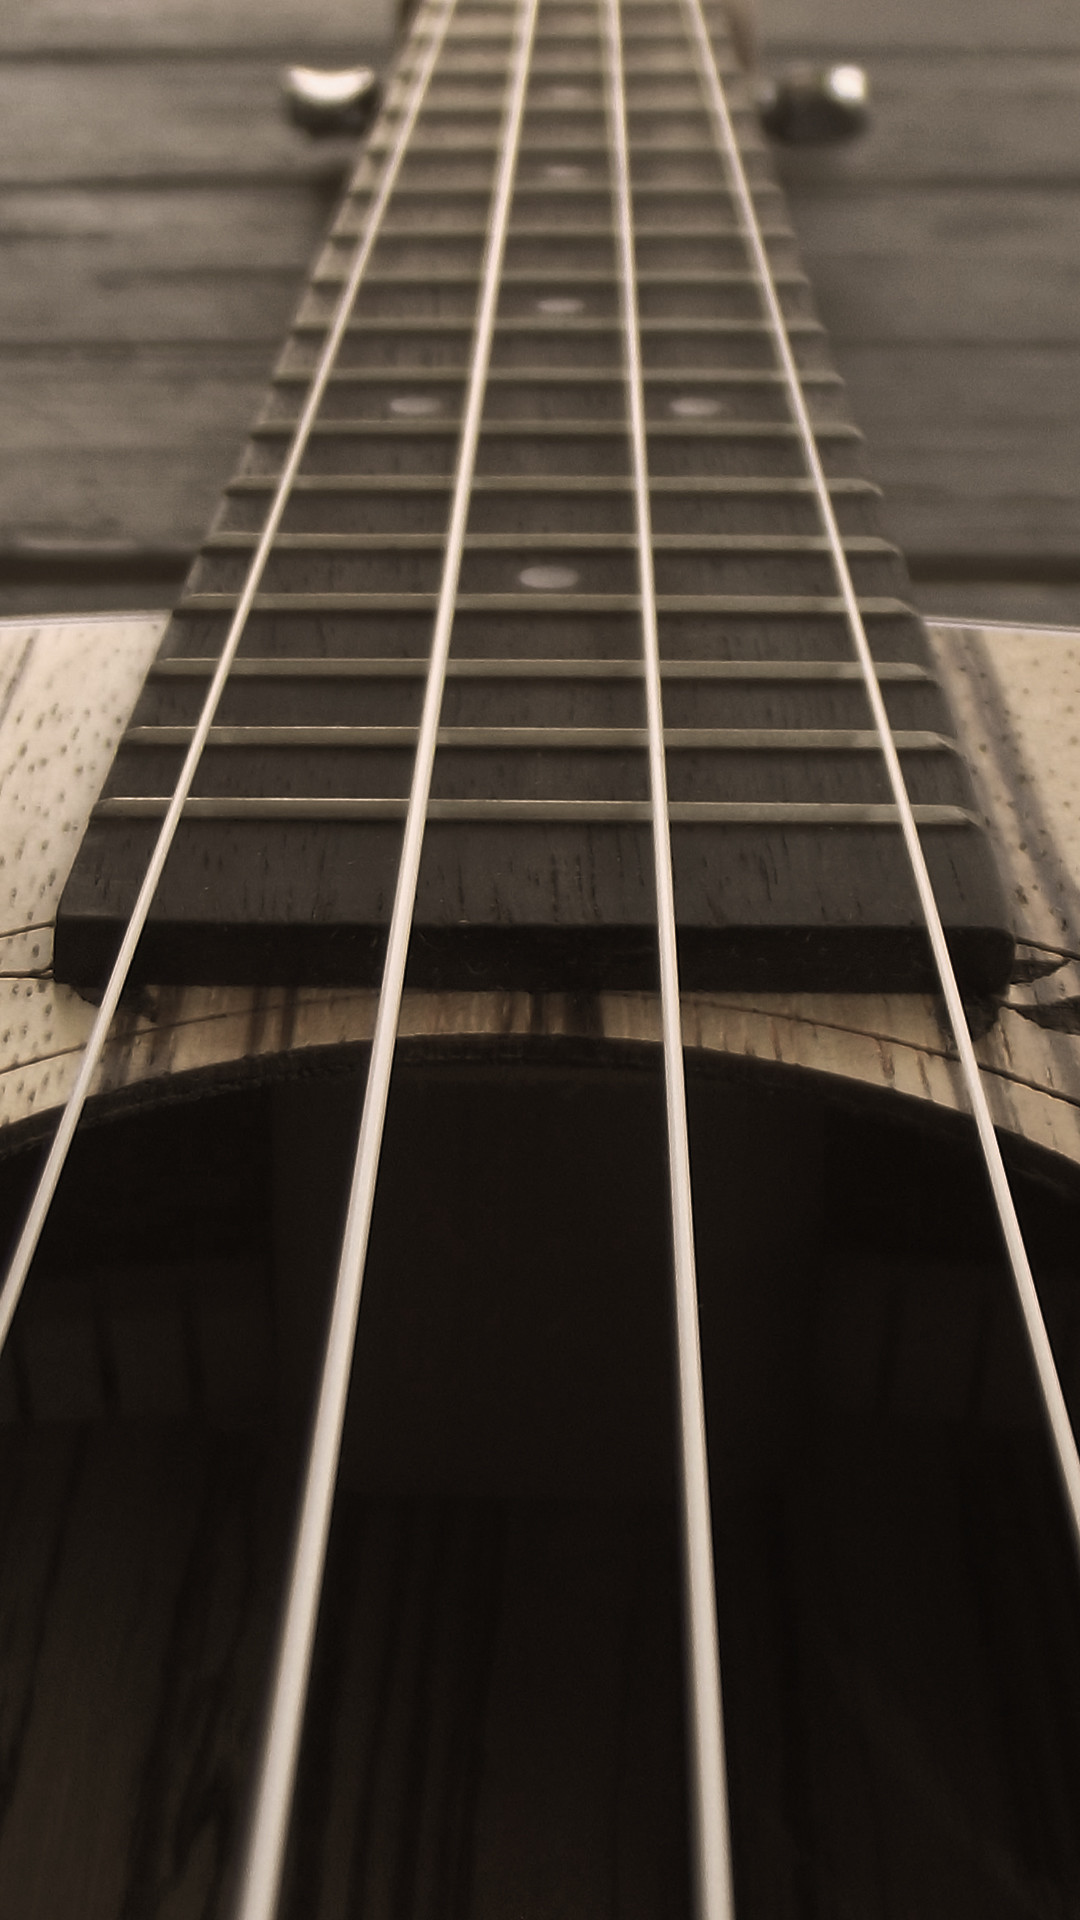 1920x1080 1920x1080 Wallpaper guitar, music, strings, bass guitar, electric guitar